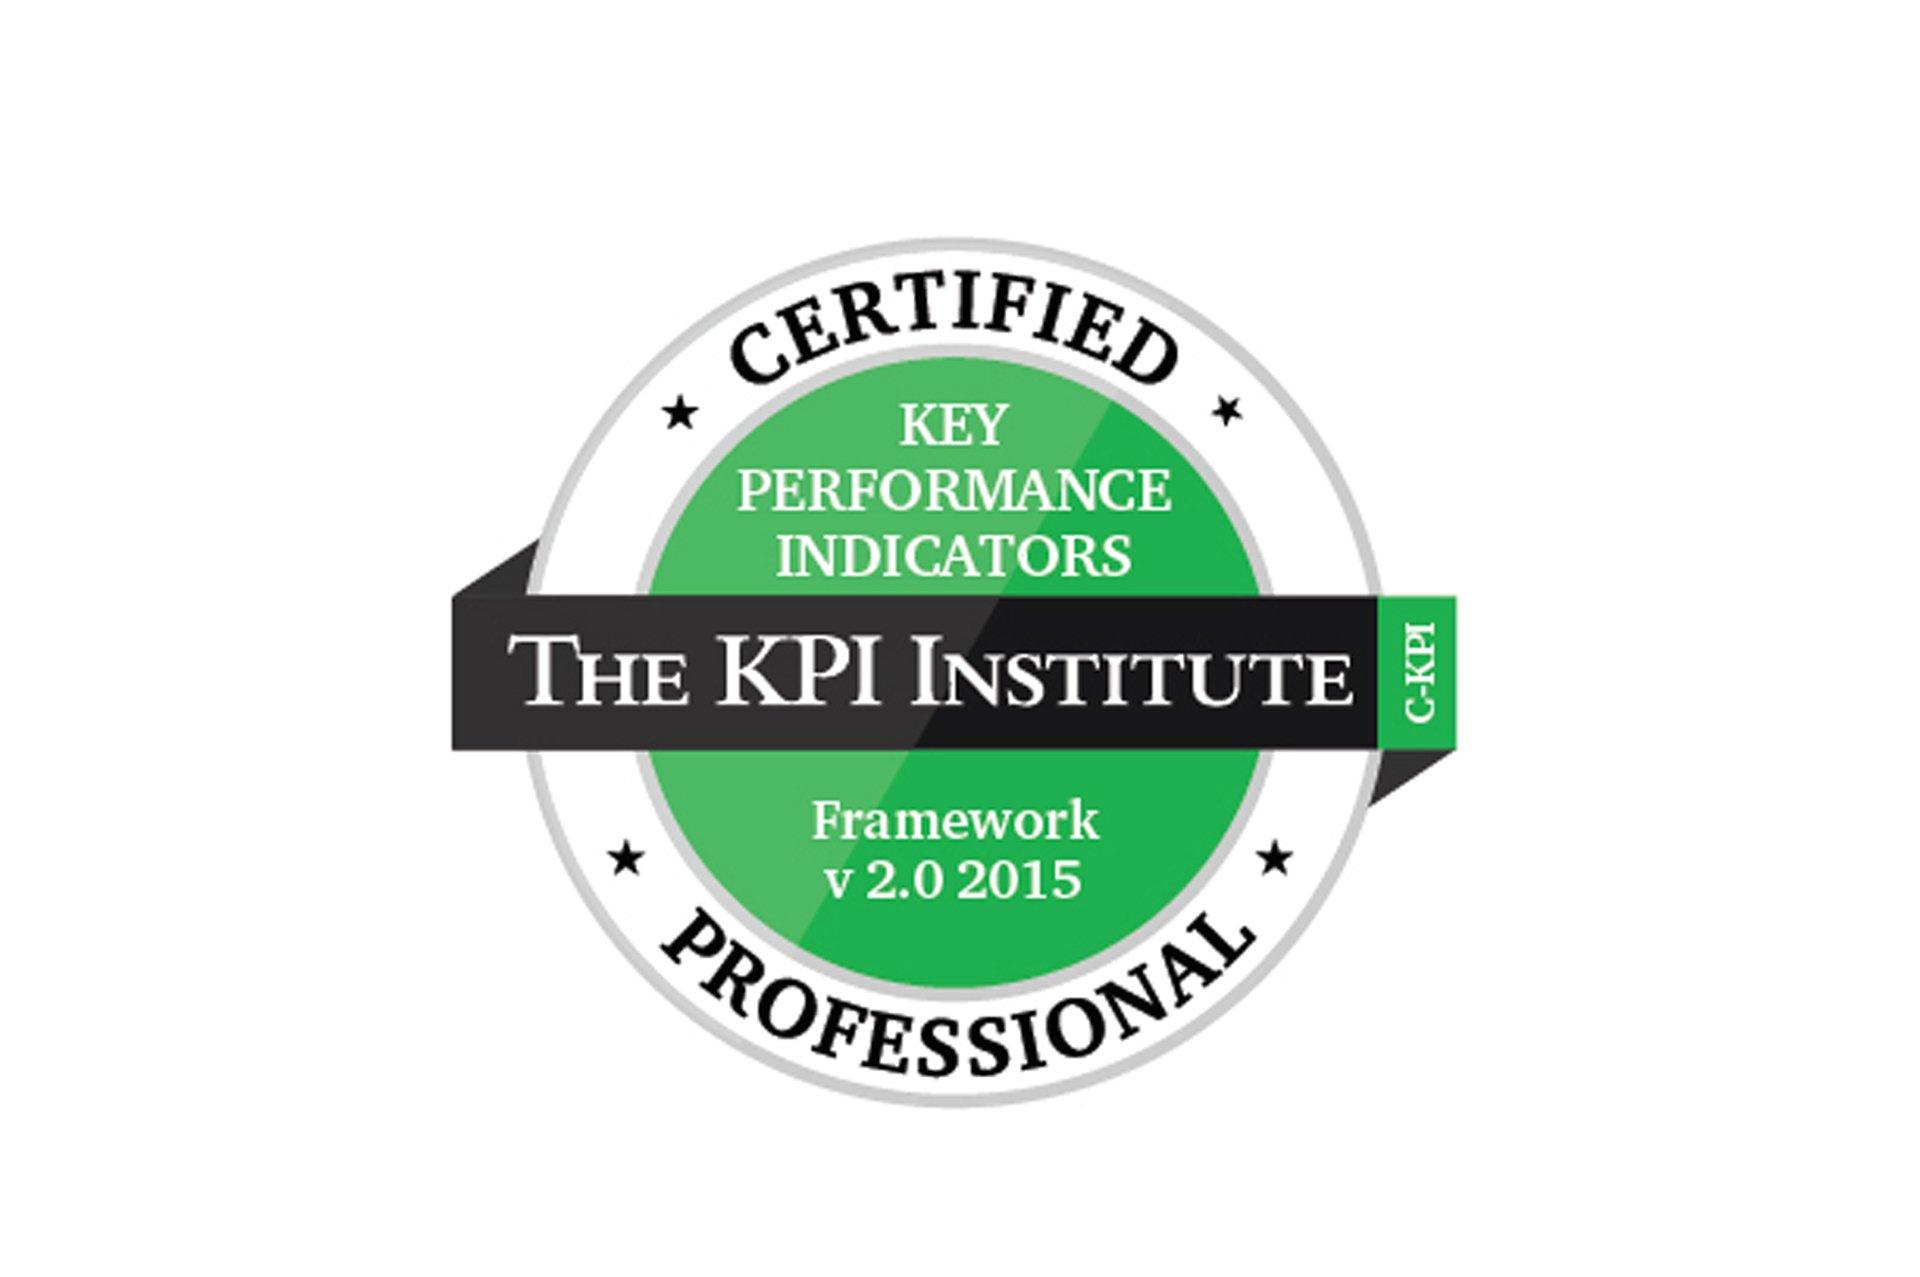 Certified KPI Professional сургалт